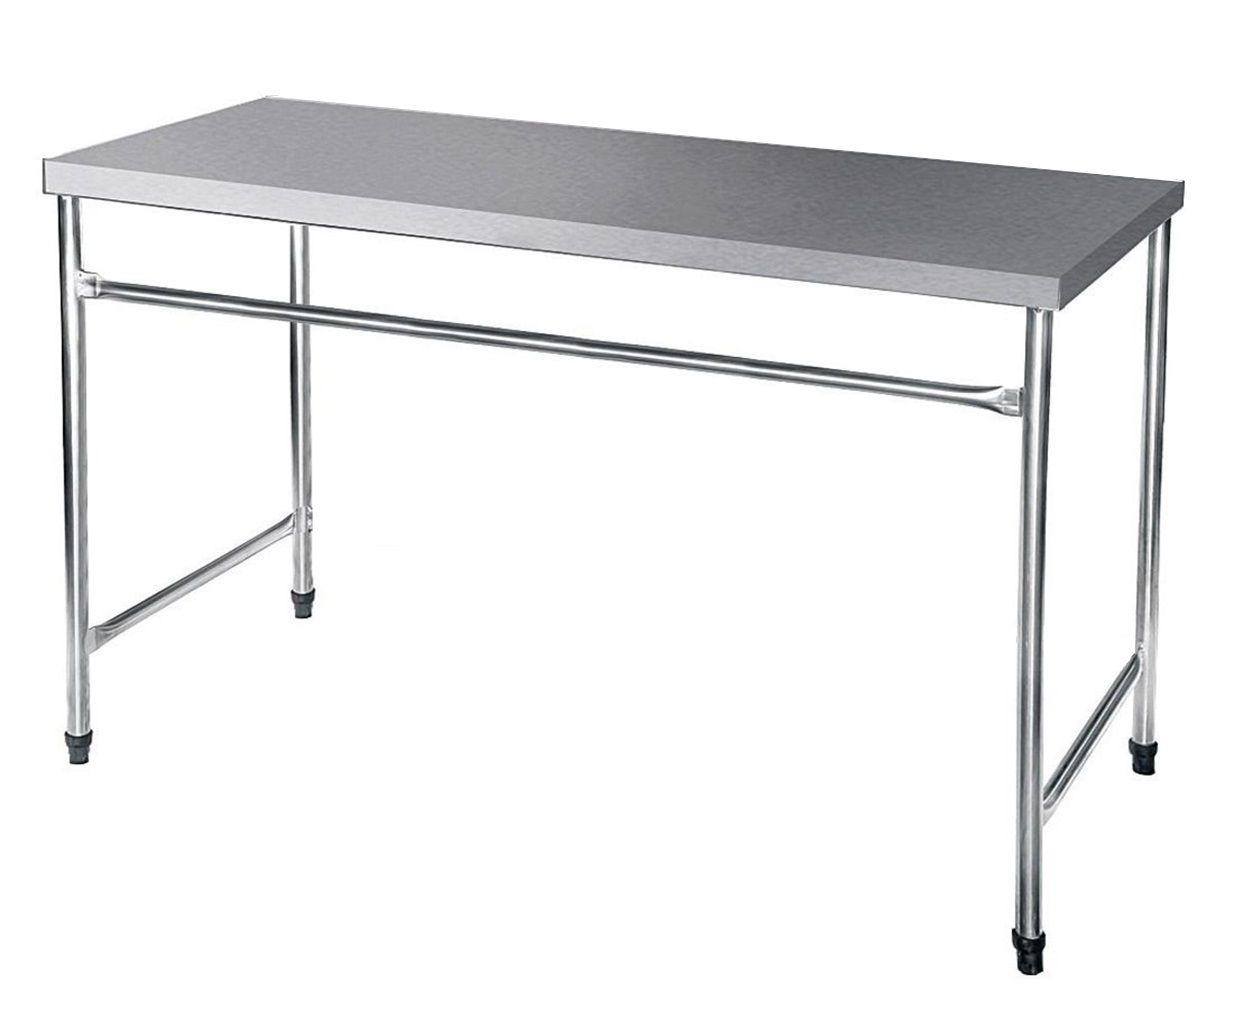 Bancada / Mesa Em Aço Inox (160x70x85)